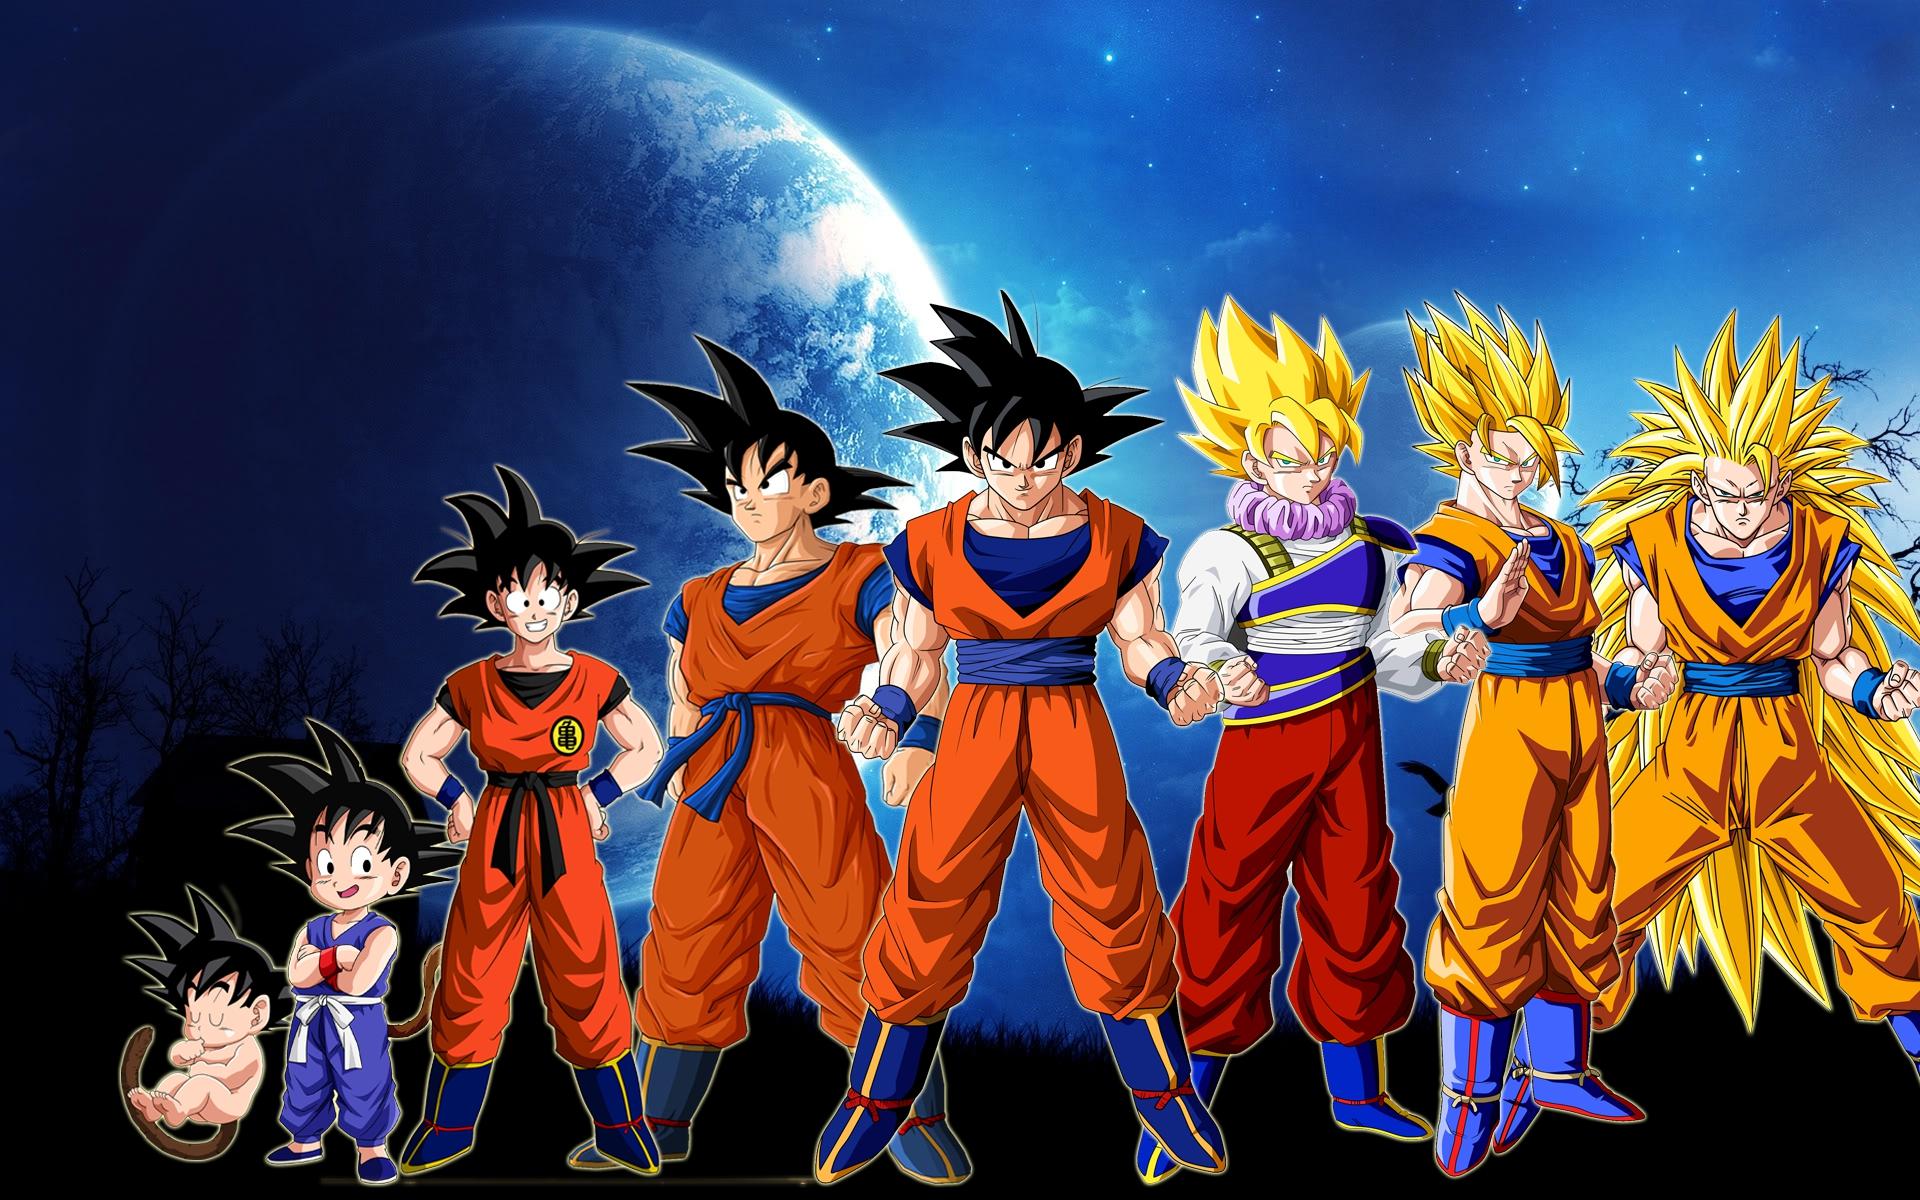 Dragonball Goku Evolution Anime Hd Wallpaper 1920x1200 Full HD 1920x1200